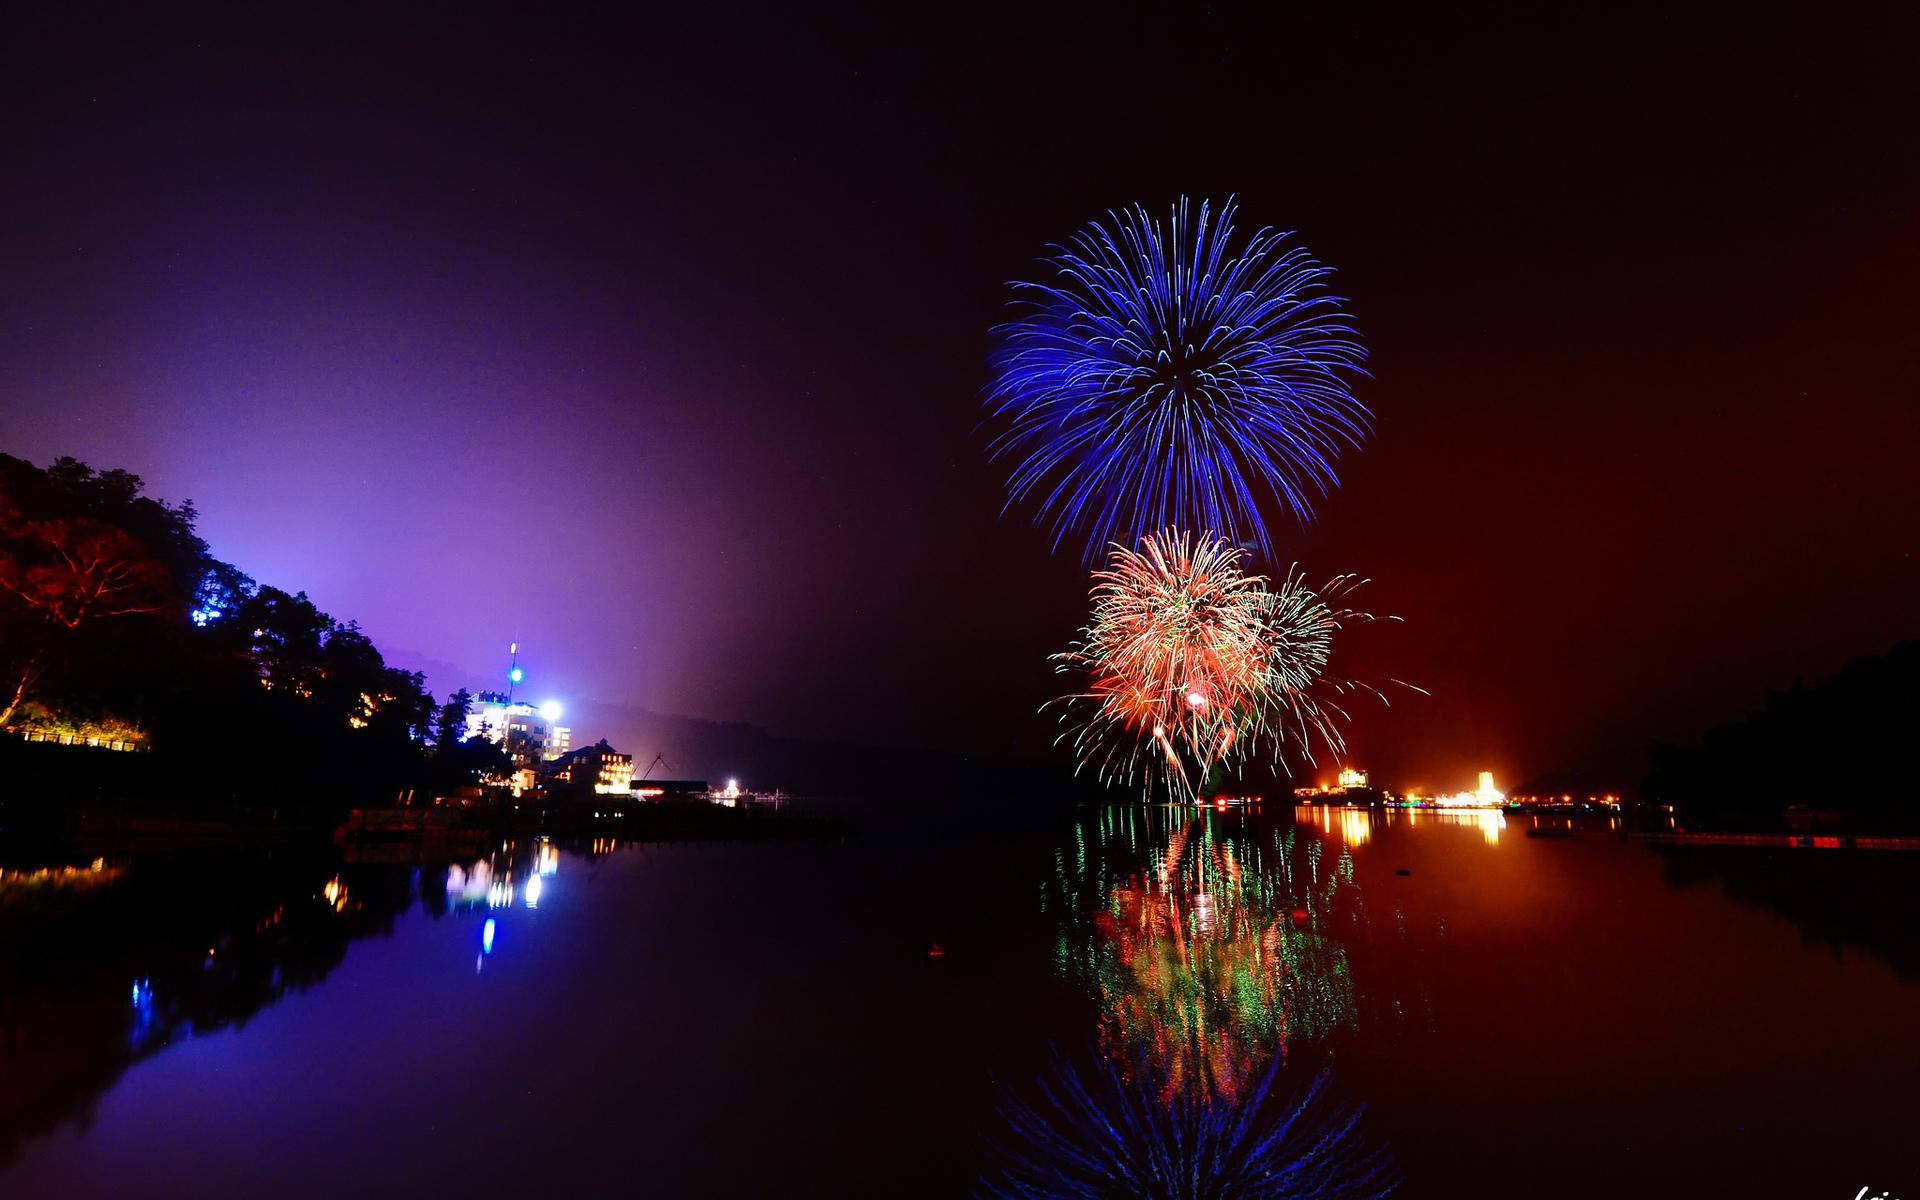 Fireworks Wallpaper Free: Fireworks HD Wallpaper